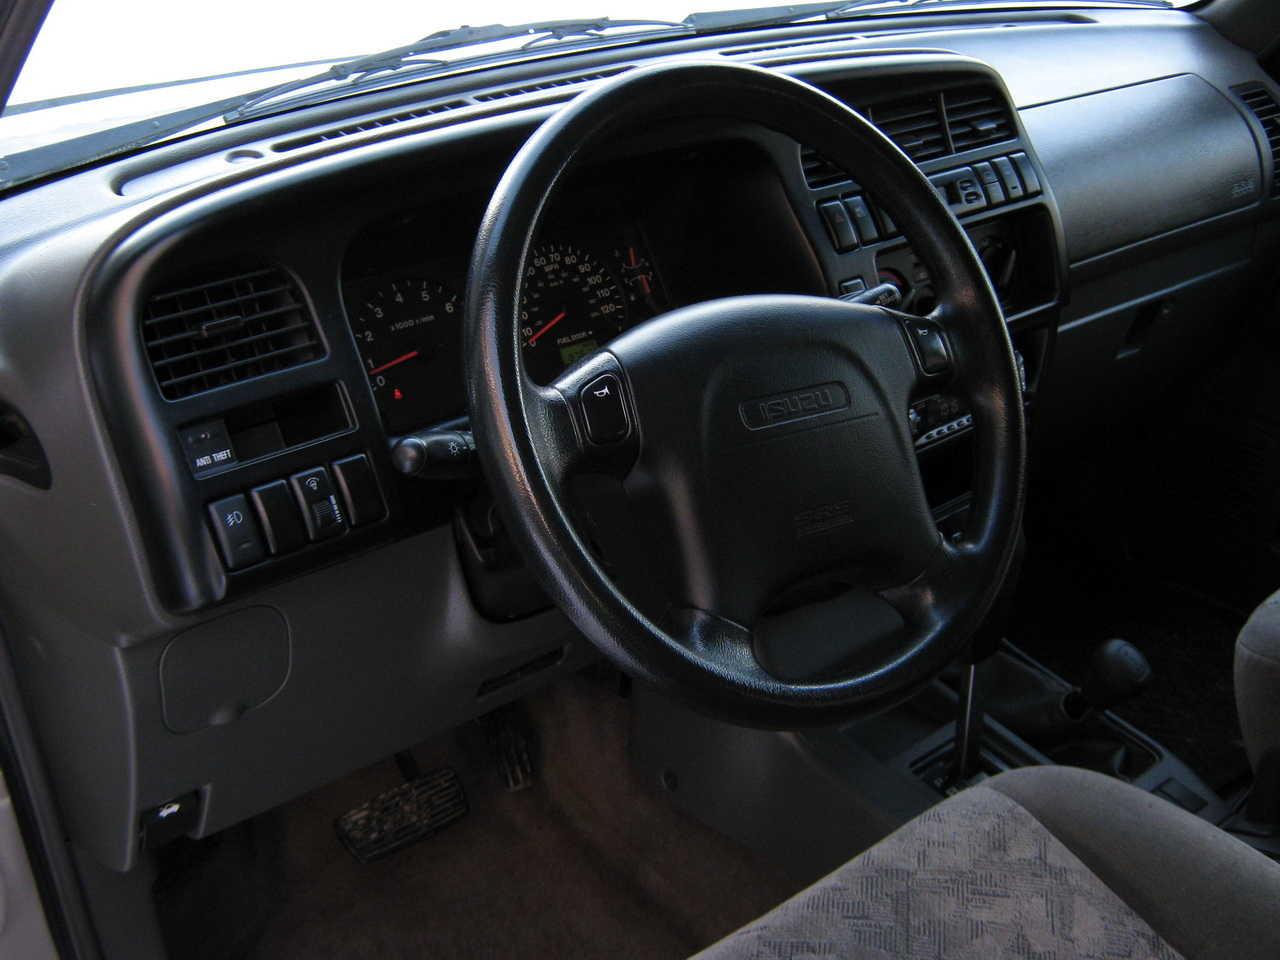 2002 Isuzu Trooper For Sale 3 5 Gasoline Automatic For Sale